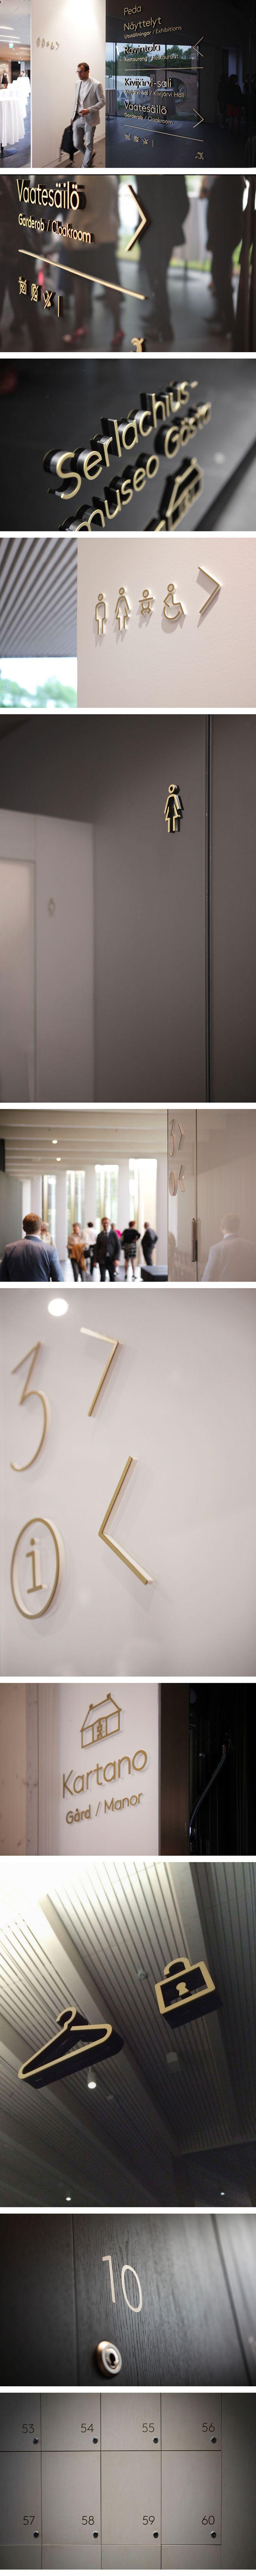 Serlachius Museum signage project by petitcomite.net.